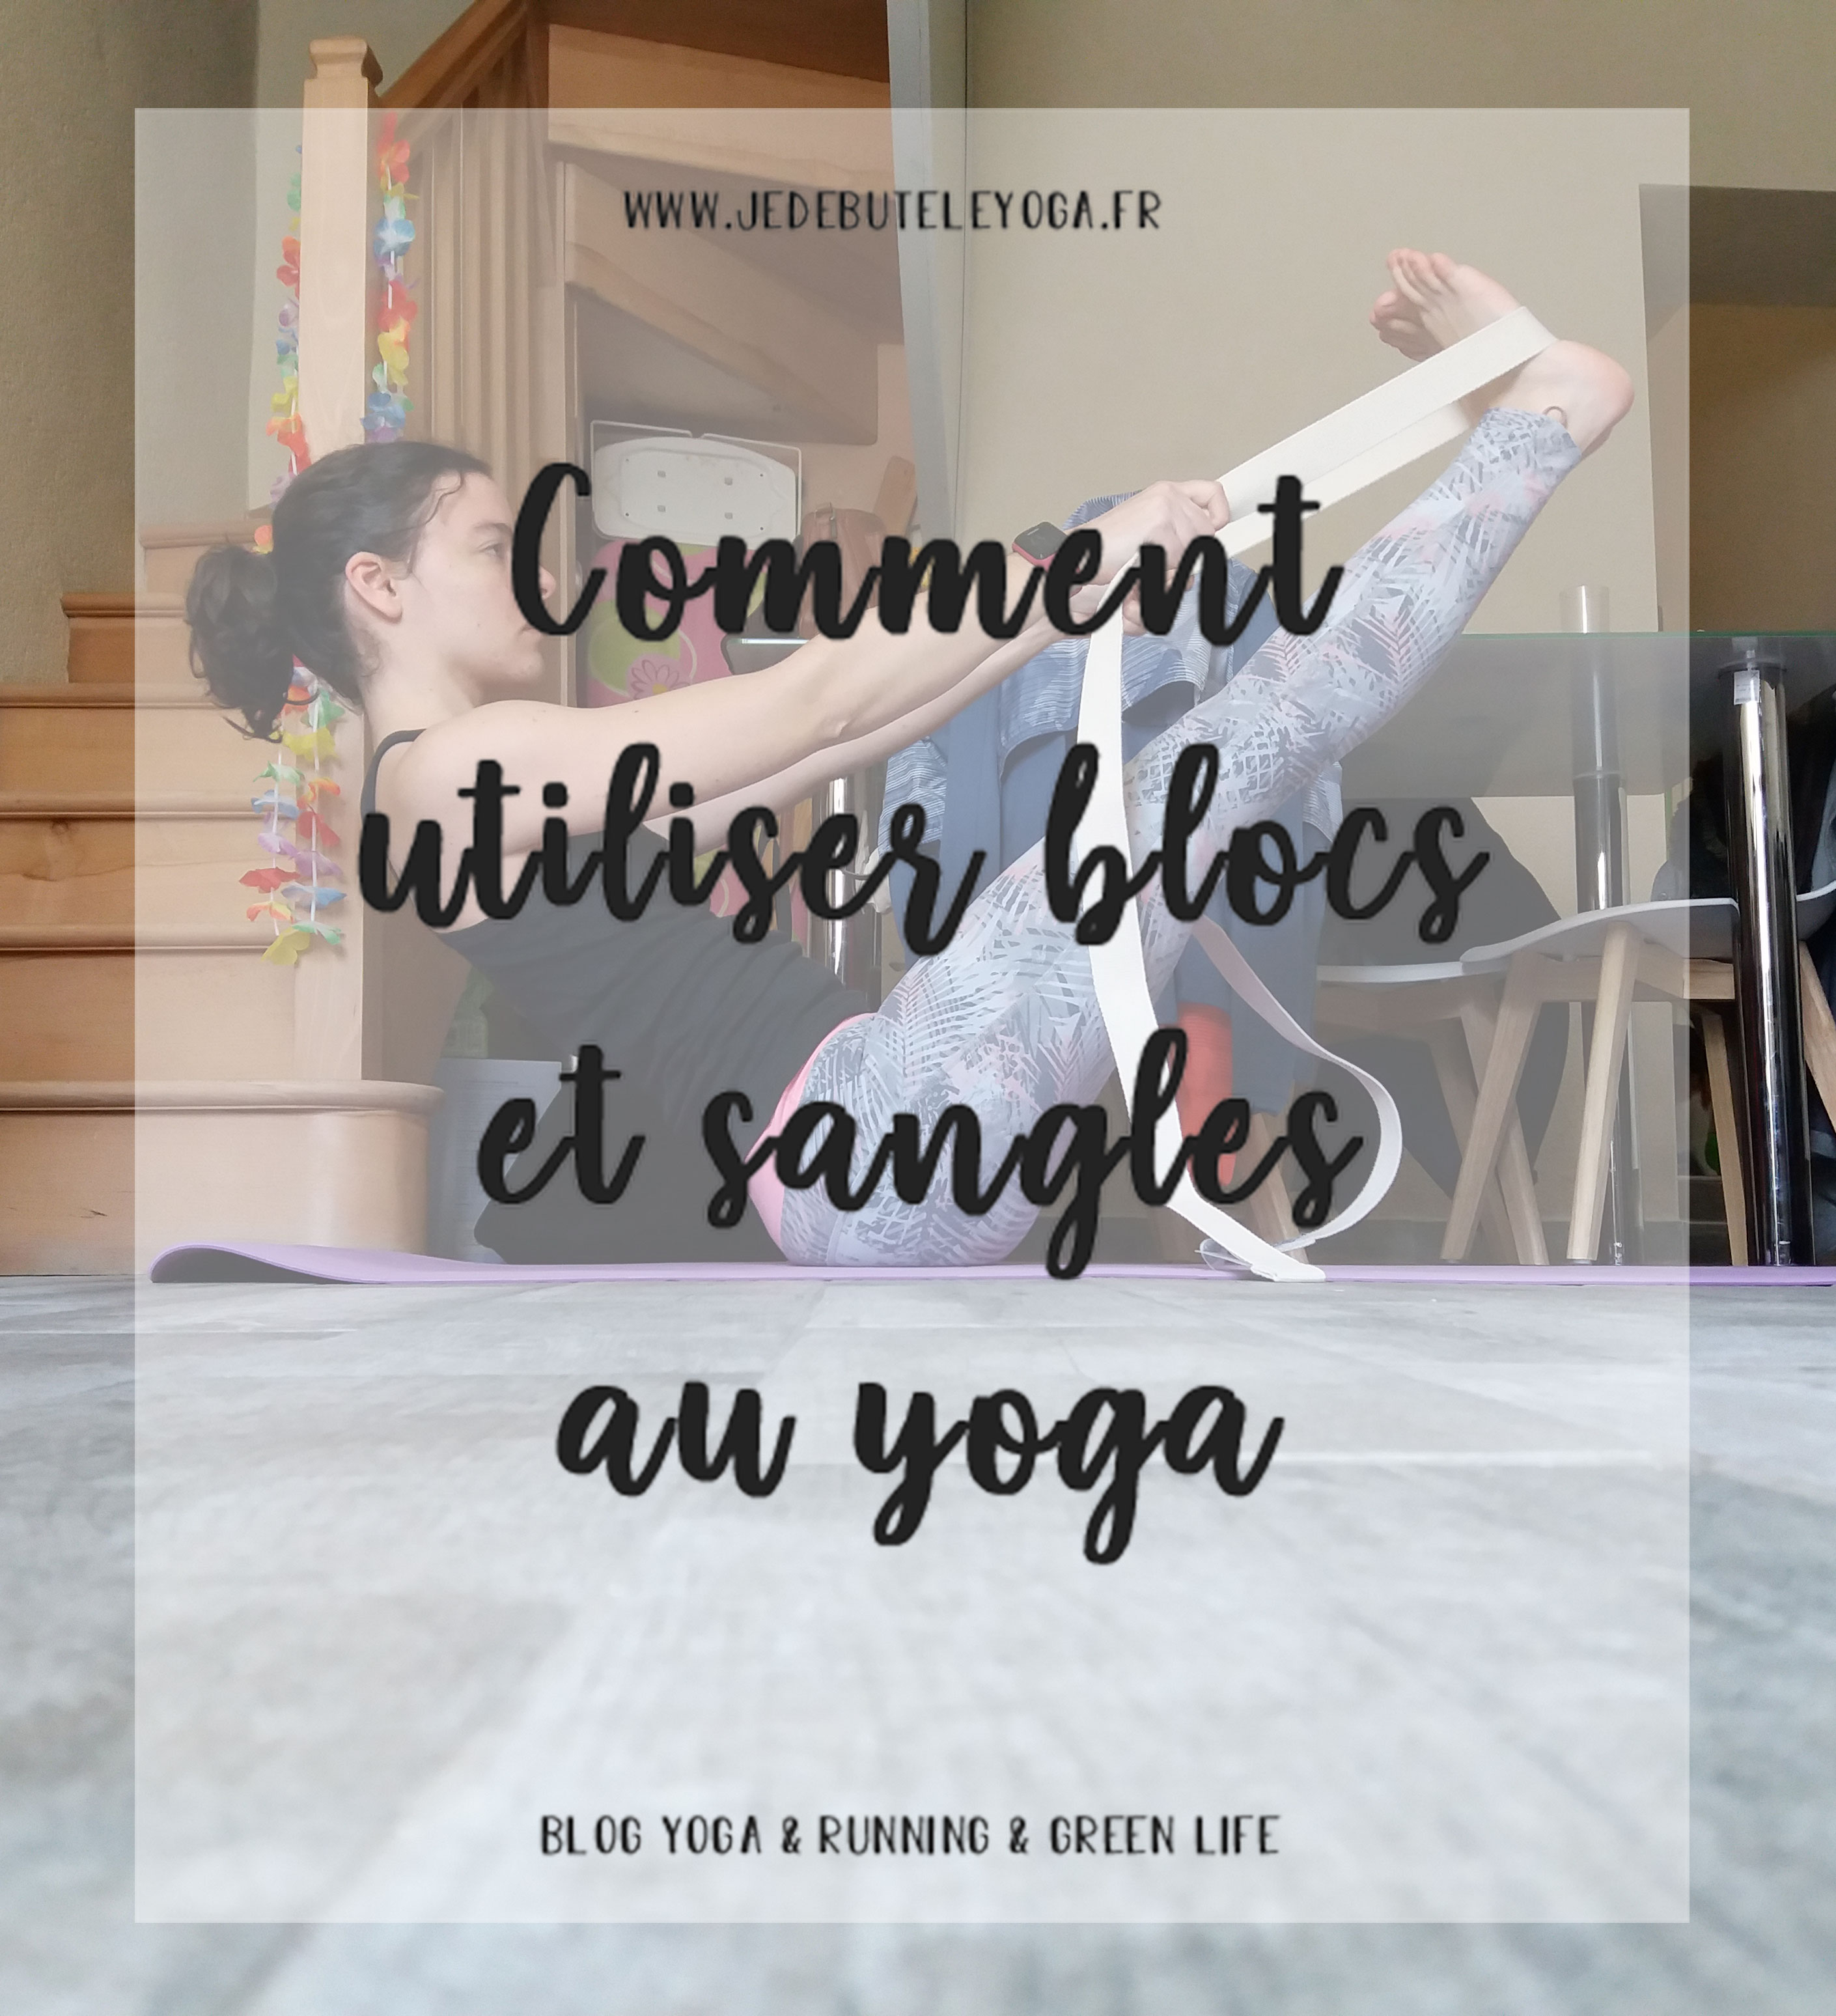 utiliser blocs et sangles au yoga